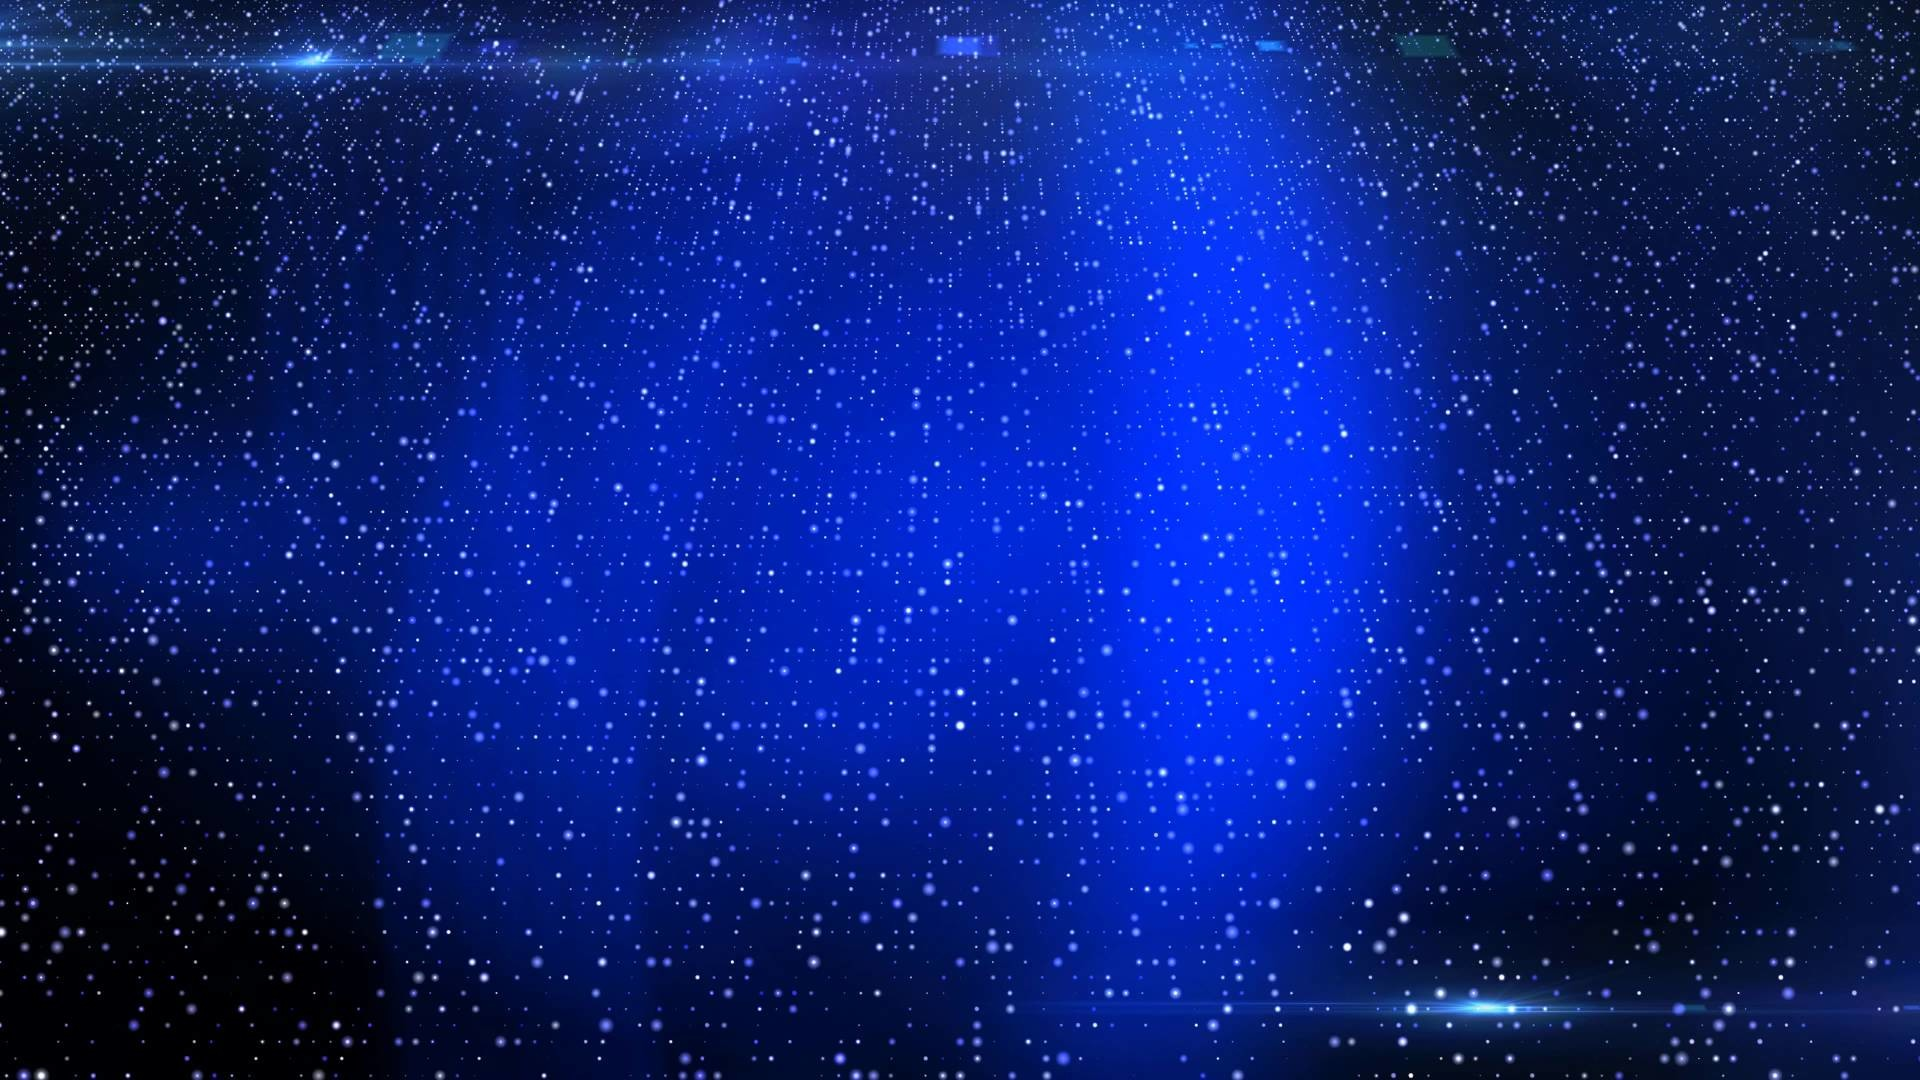 4K Blue wallpapers